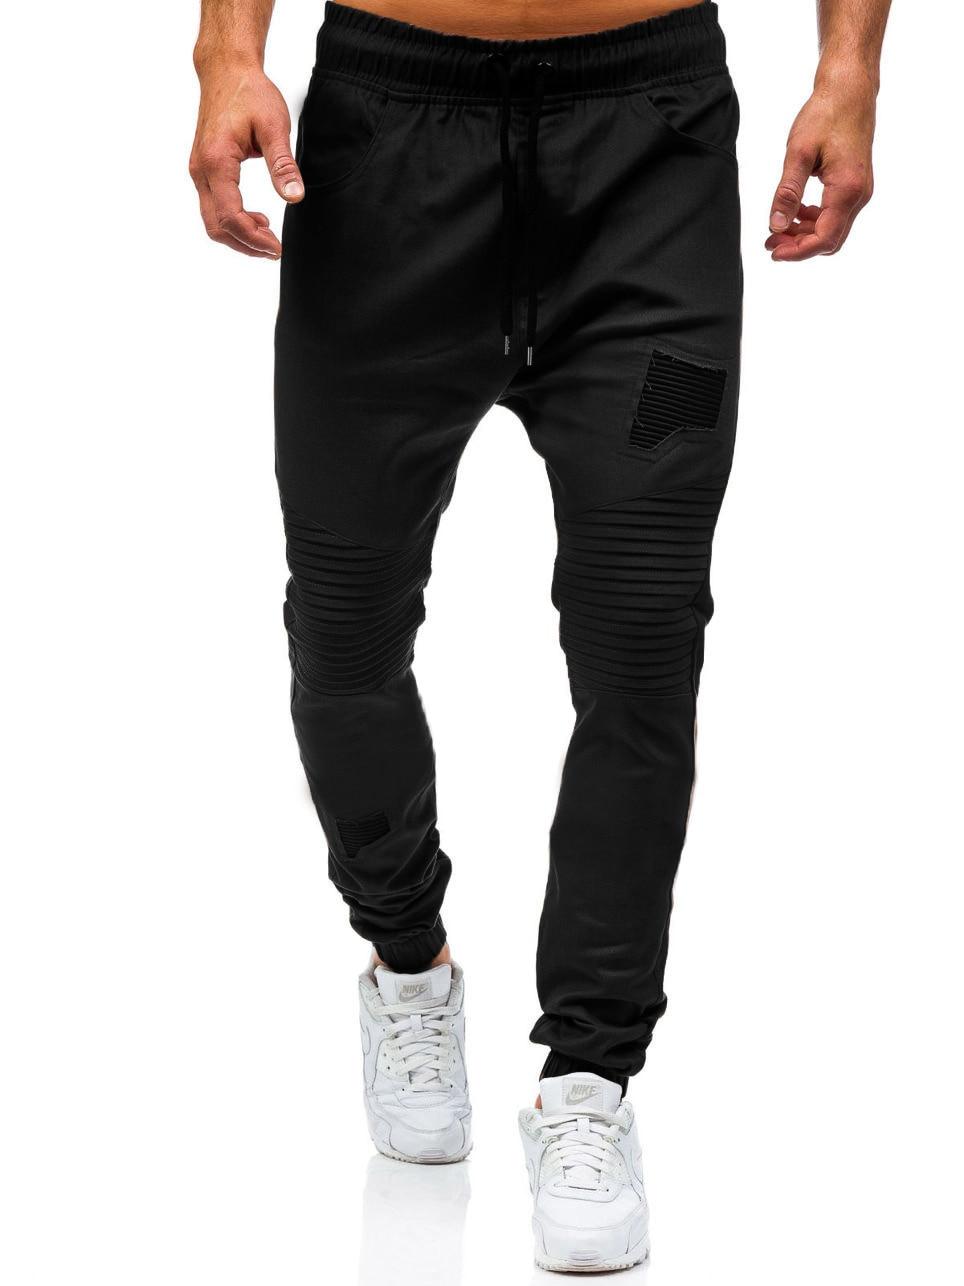 Men Sweatpants Casual Pants Slim fit Drawstring Sweatpants Slacks Elastic Waist Patchwork Pleated Ultrathin Male Trousers Jogger 13